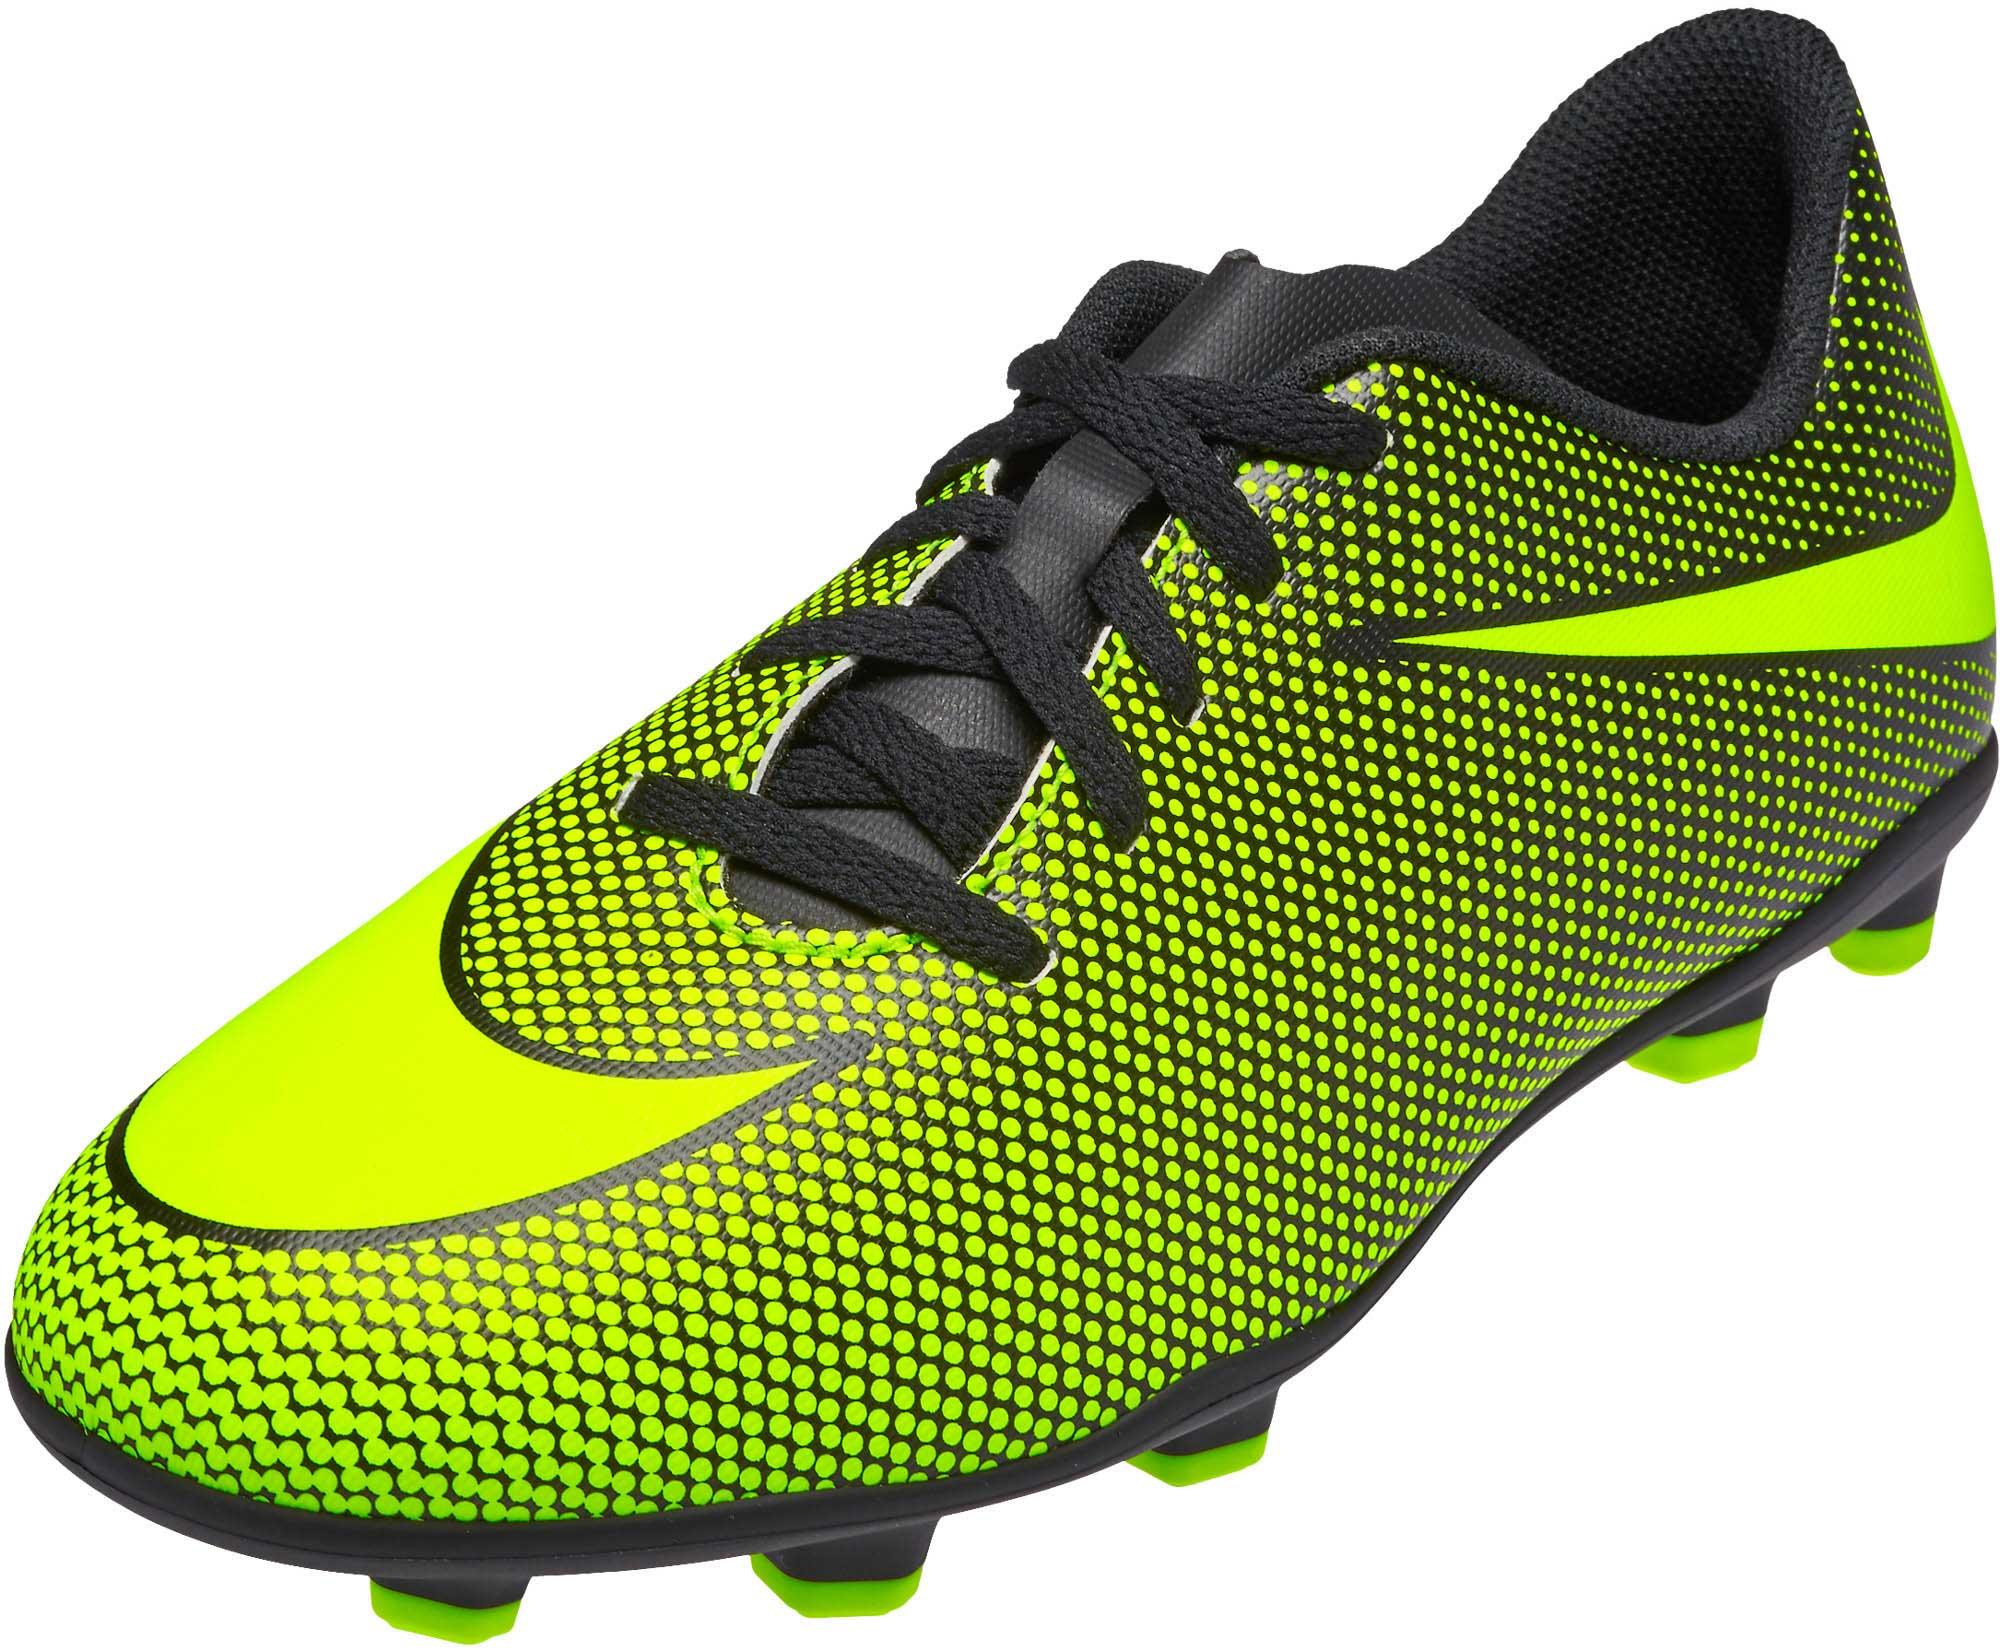 b9eb9d4d Nike Kids Bravata II FG Soccer Cleats - Black & Volt - Soccer Master